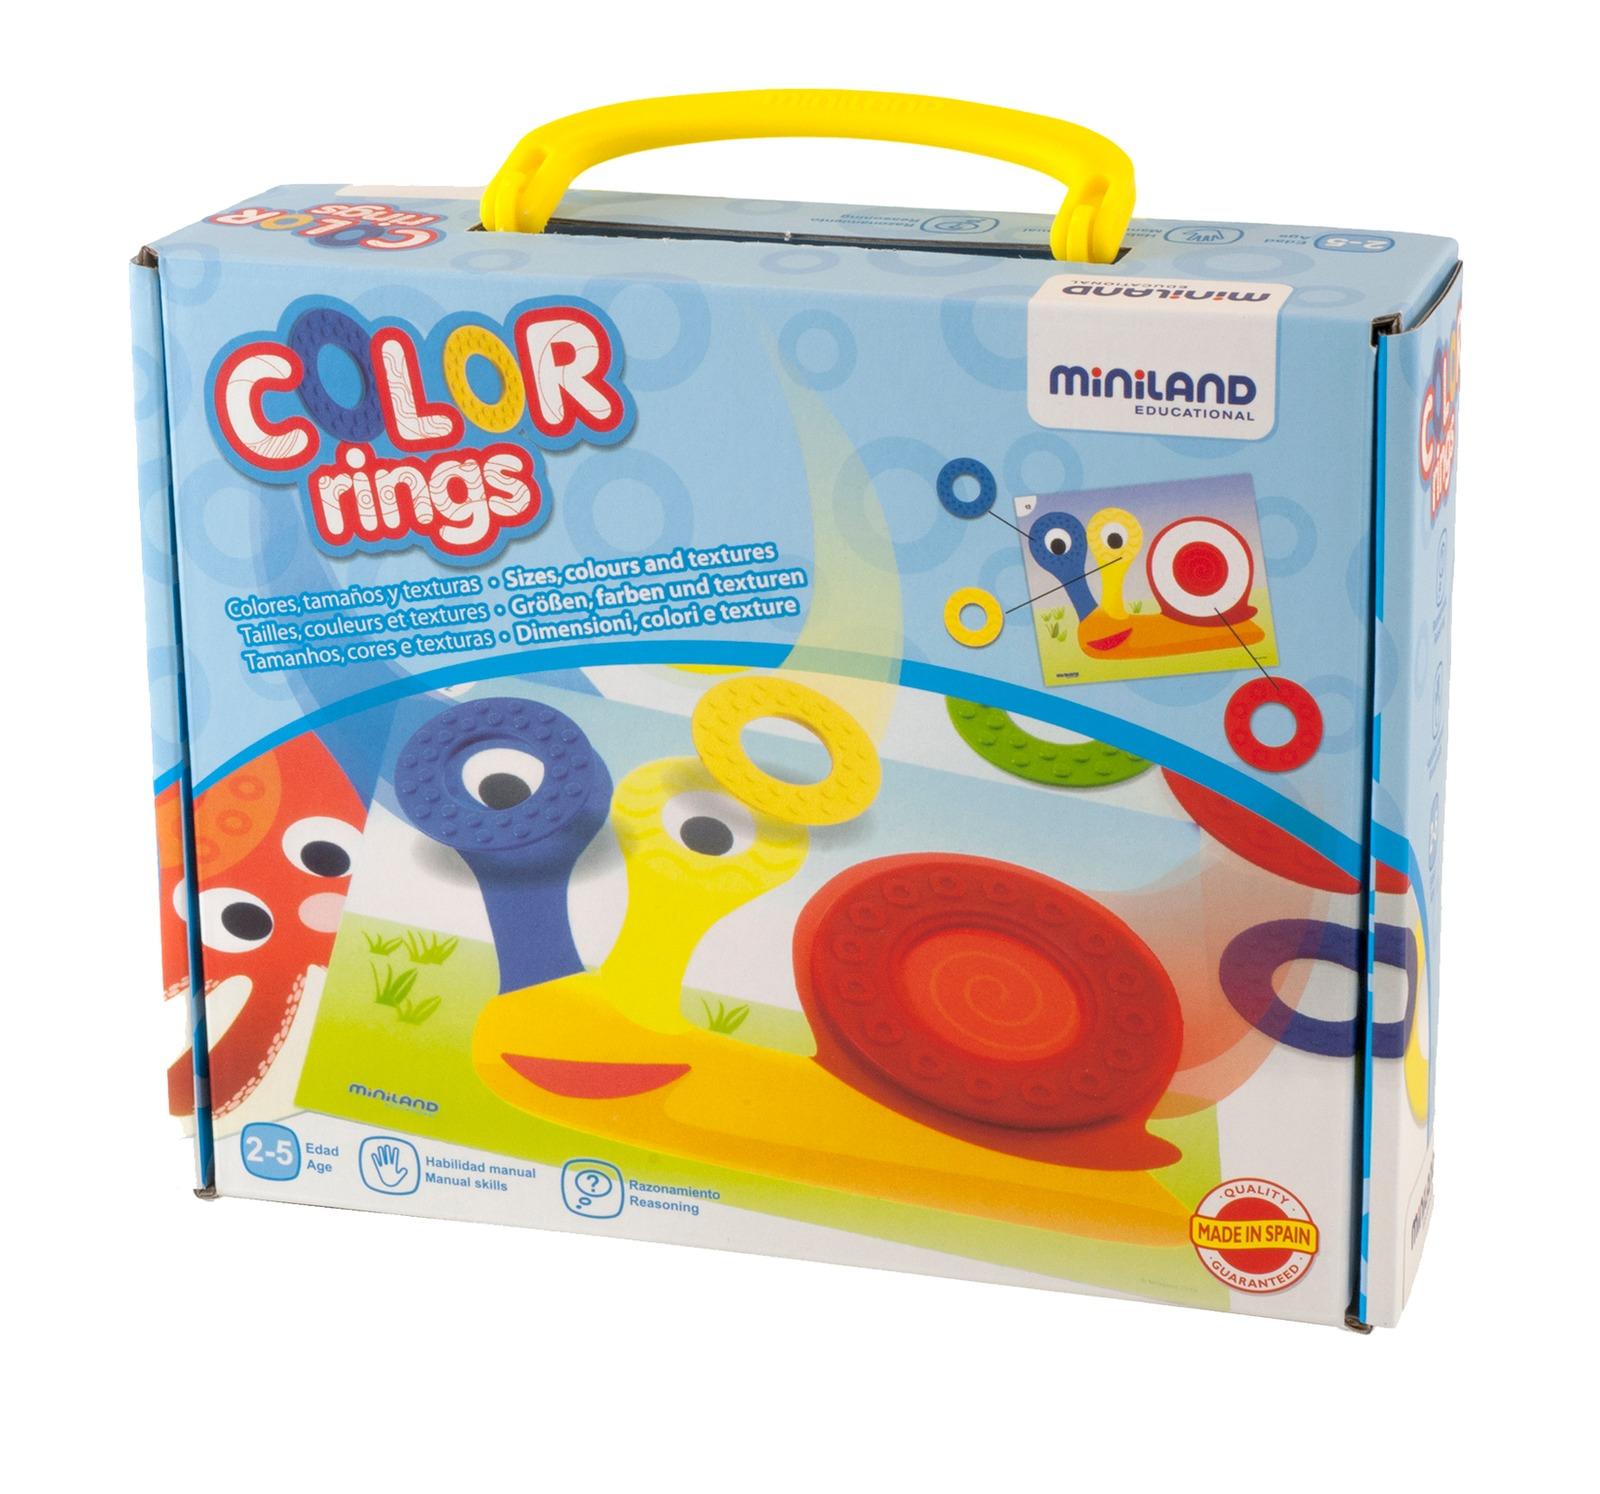 Miniland Colour Rings image